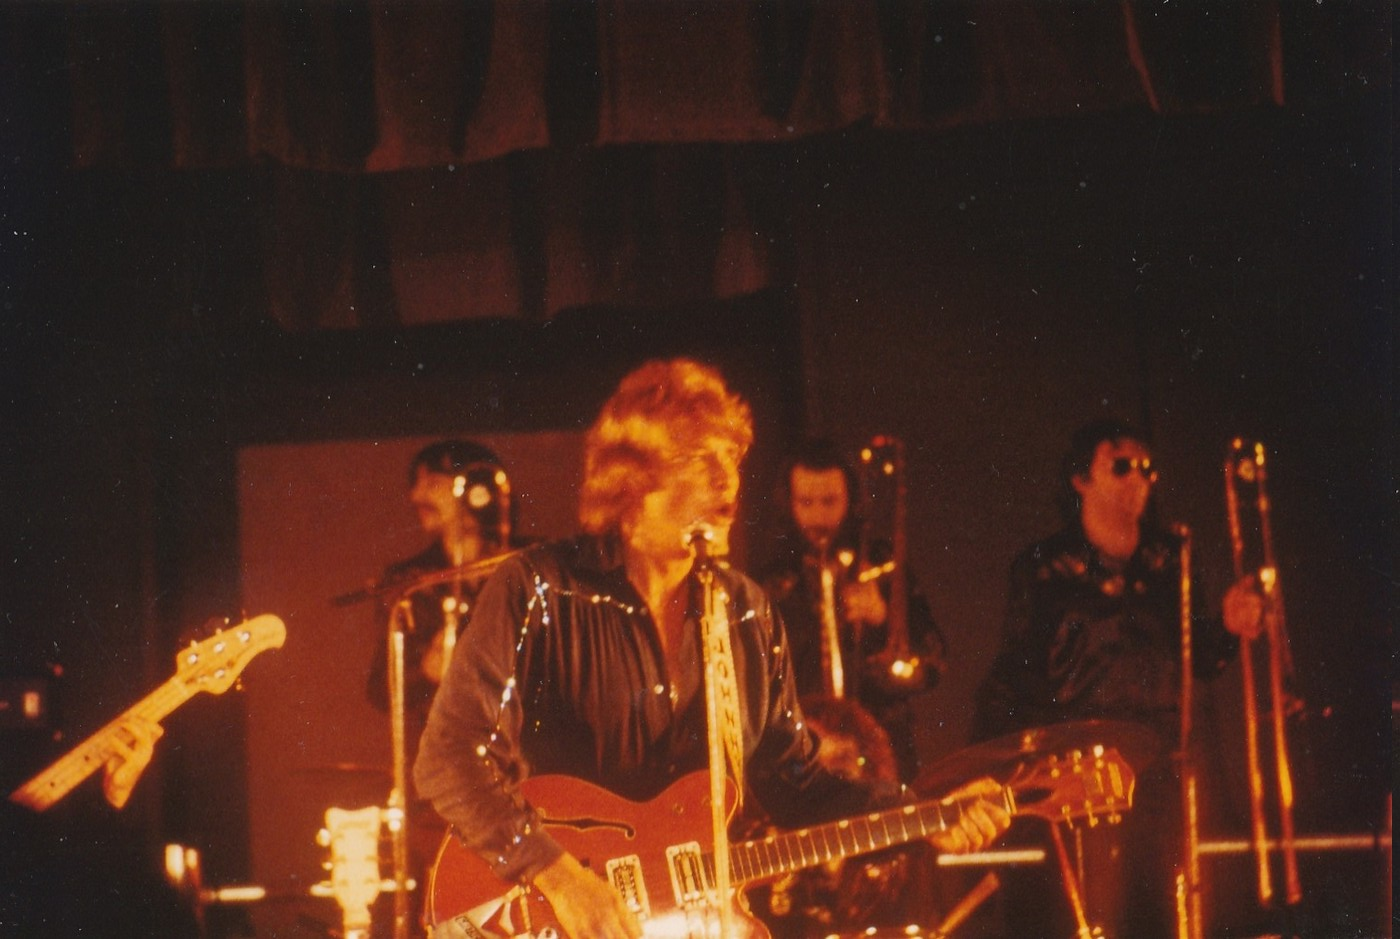 INÉDIT  :  JOHNNY HALLYDAY EN TOURNEE - HIVER 1978 -1979 ( PHOTOS INÉDITES )   Img_2632